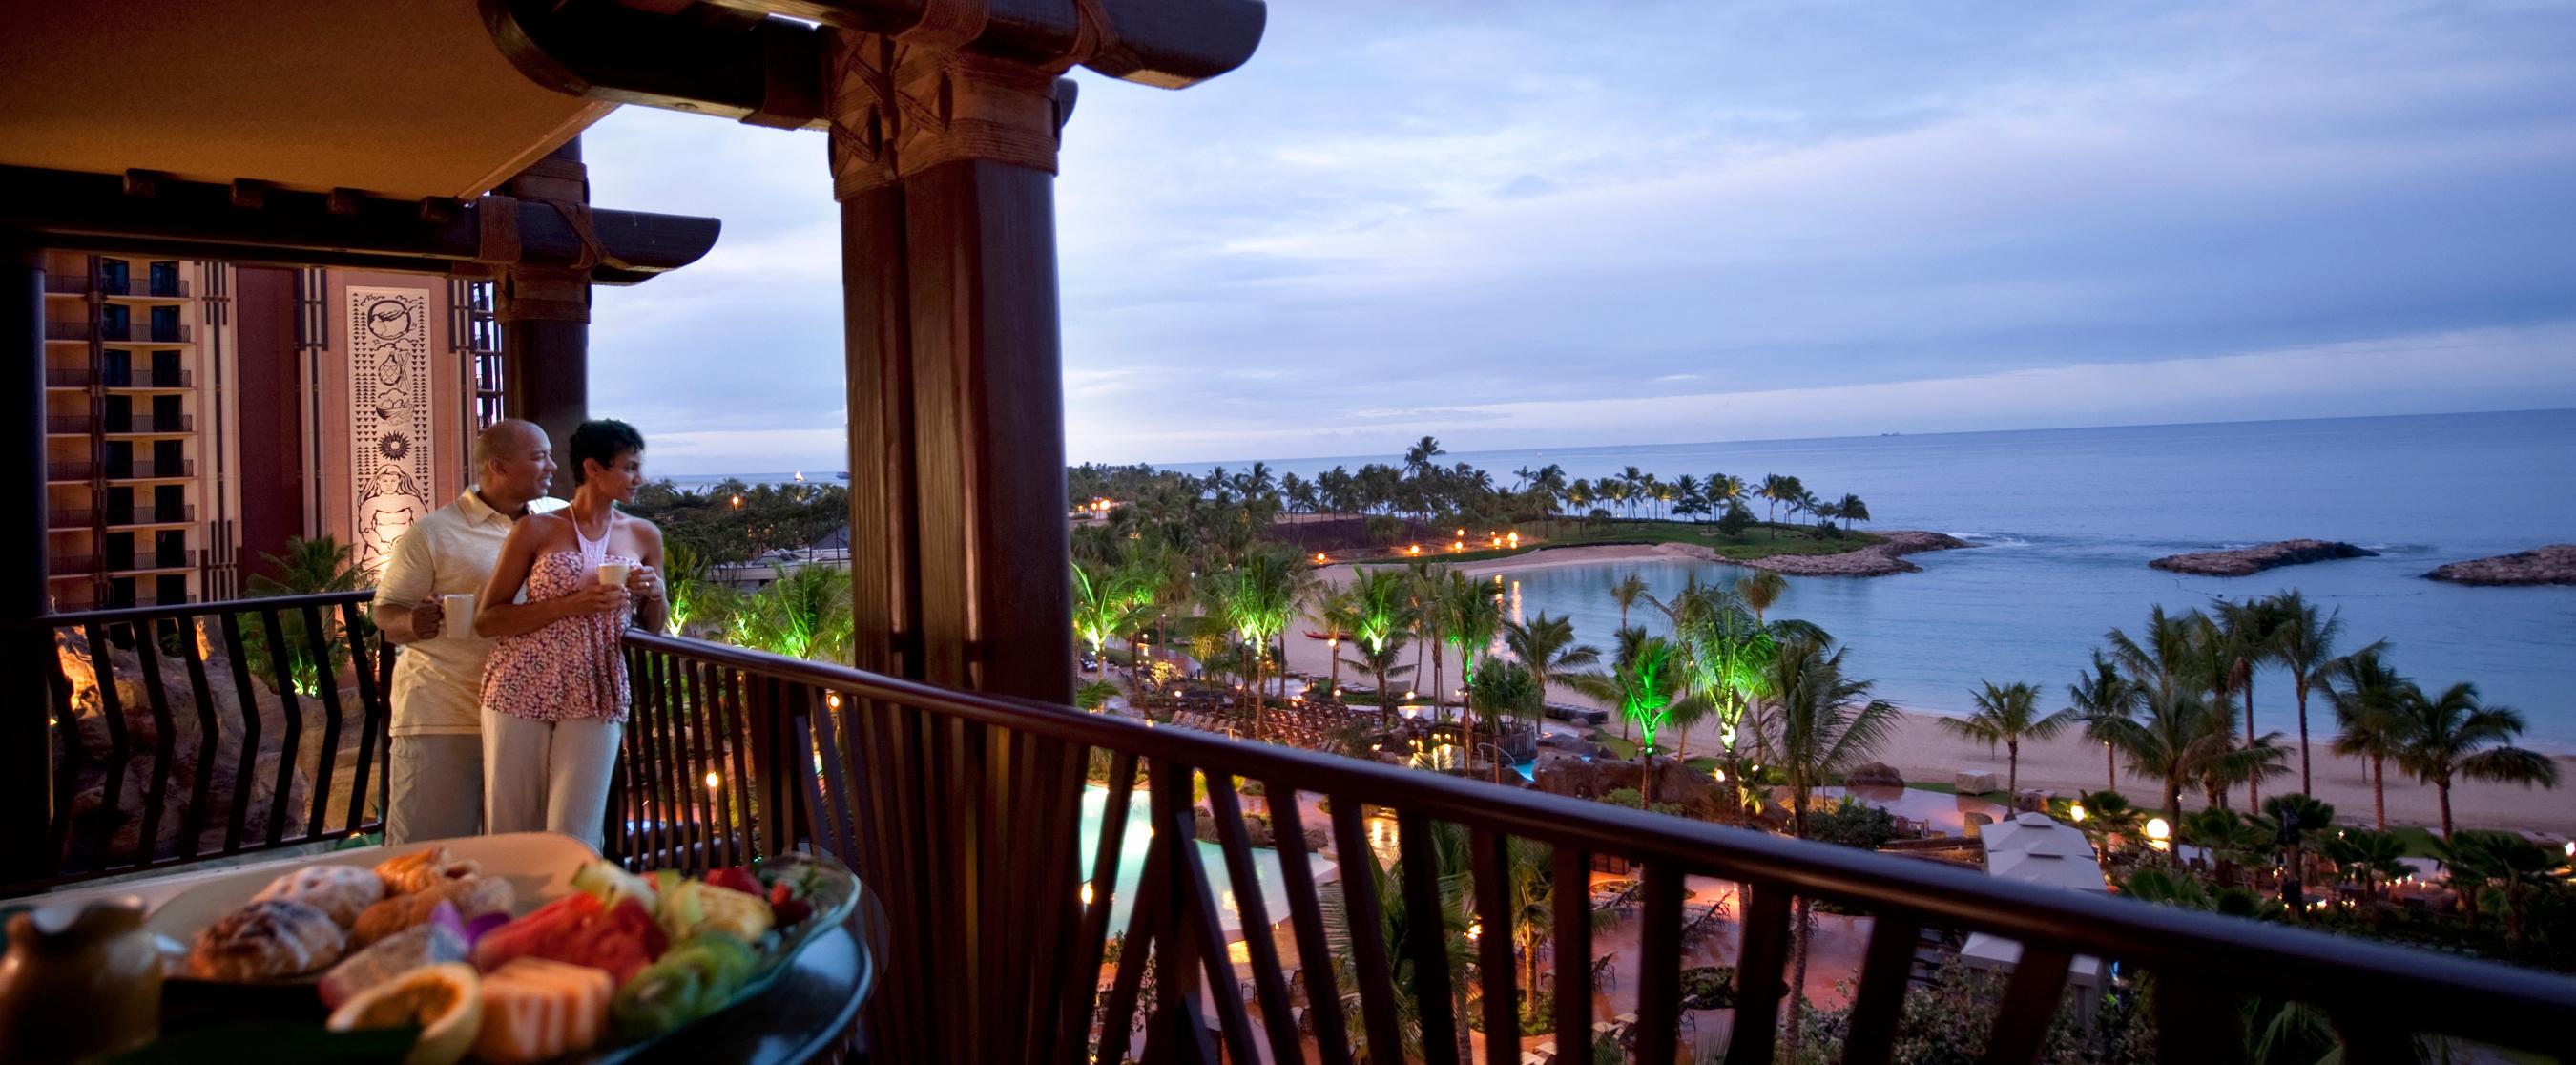 3 bedroom grand villa select villas feature sweeping for Garden view rooms at disney beach club